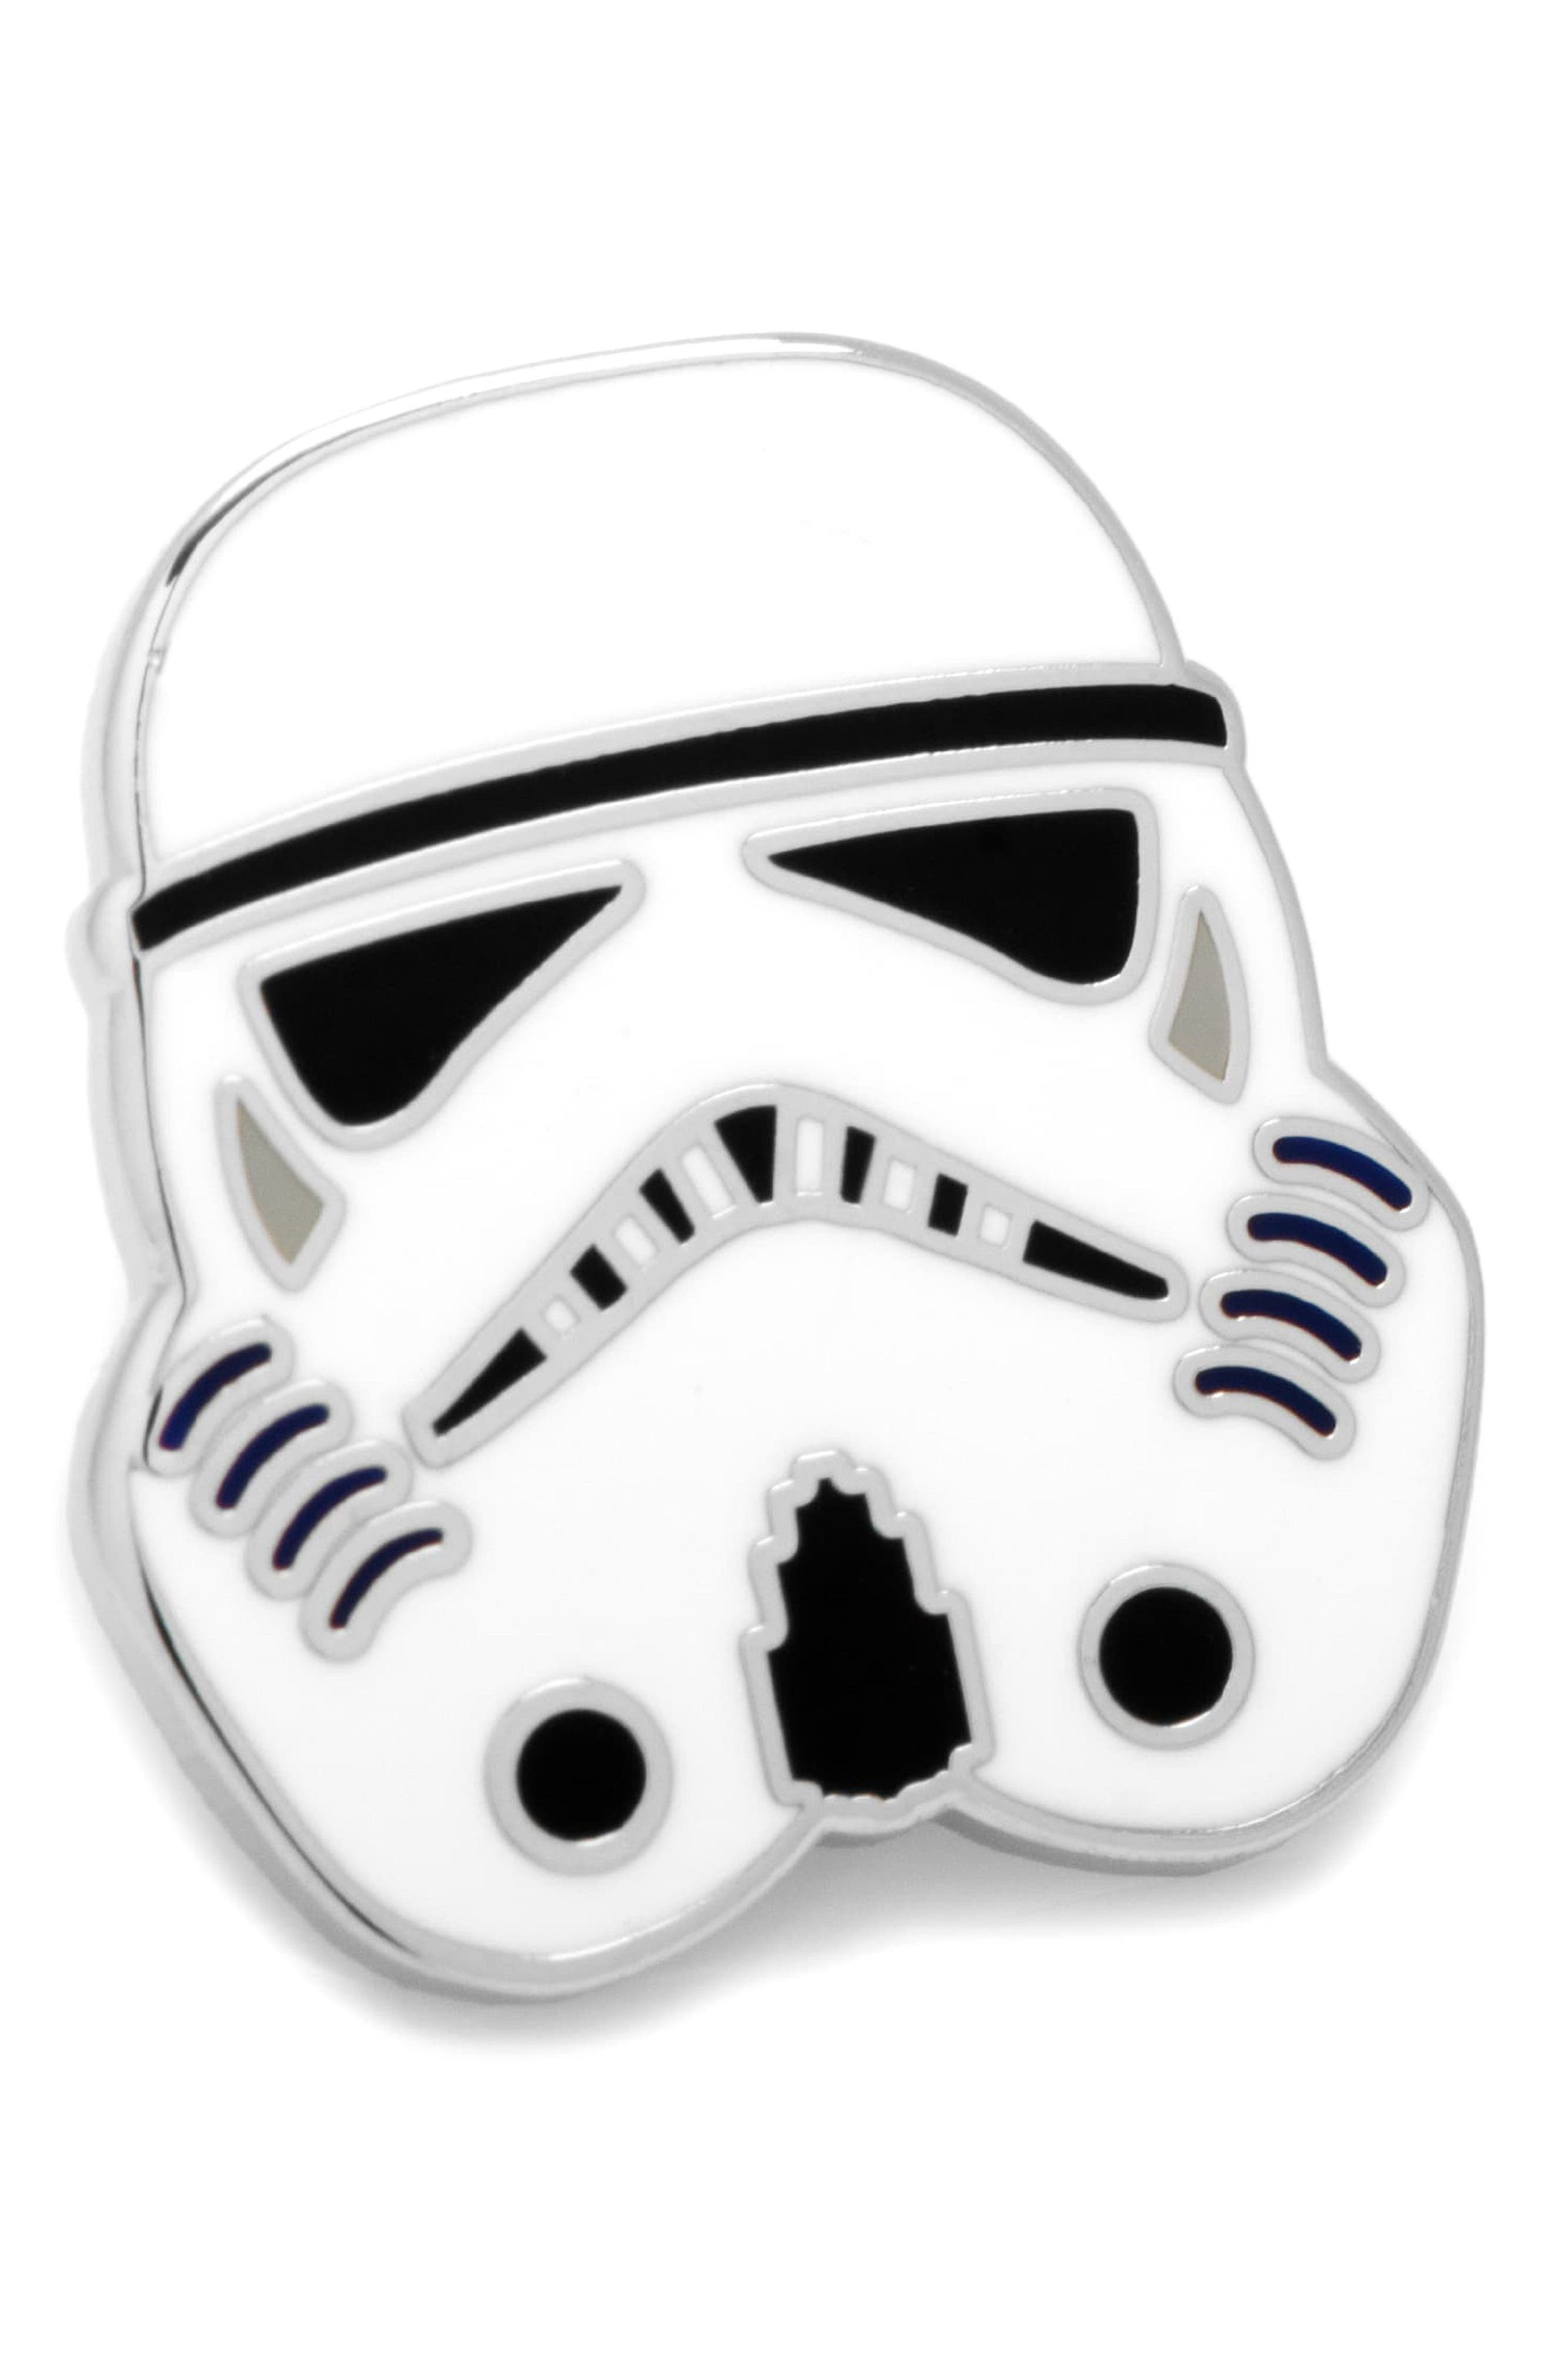 Star Wars<sup>™</sup> - Stormtrooper Lapel Pin,                             Main thumbnail 1, color,                             040